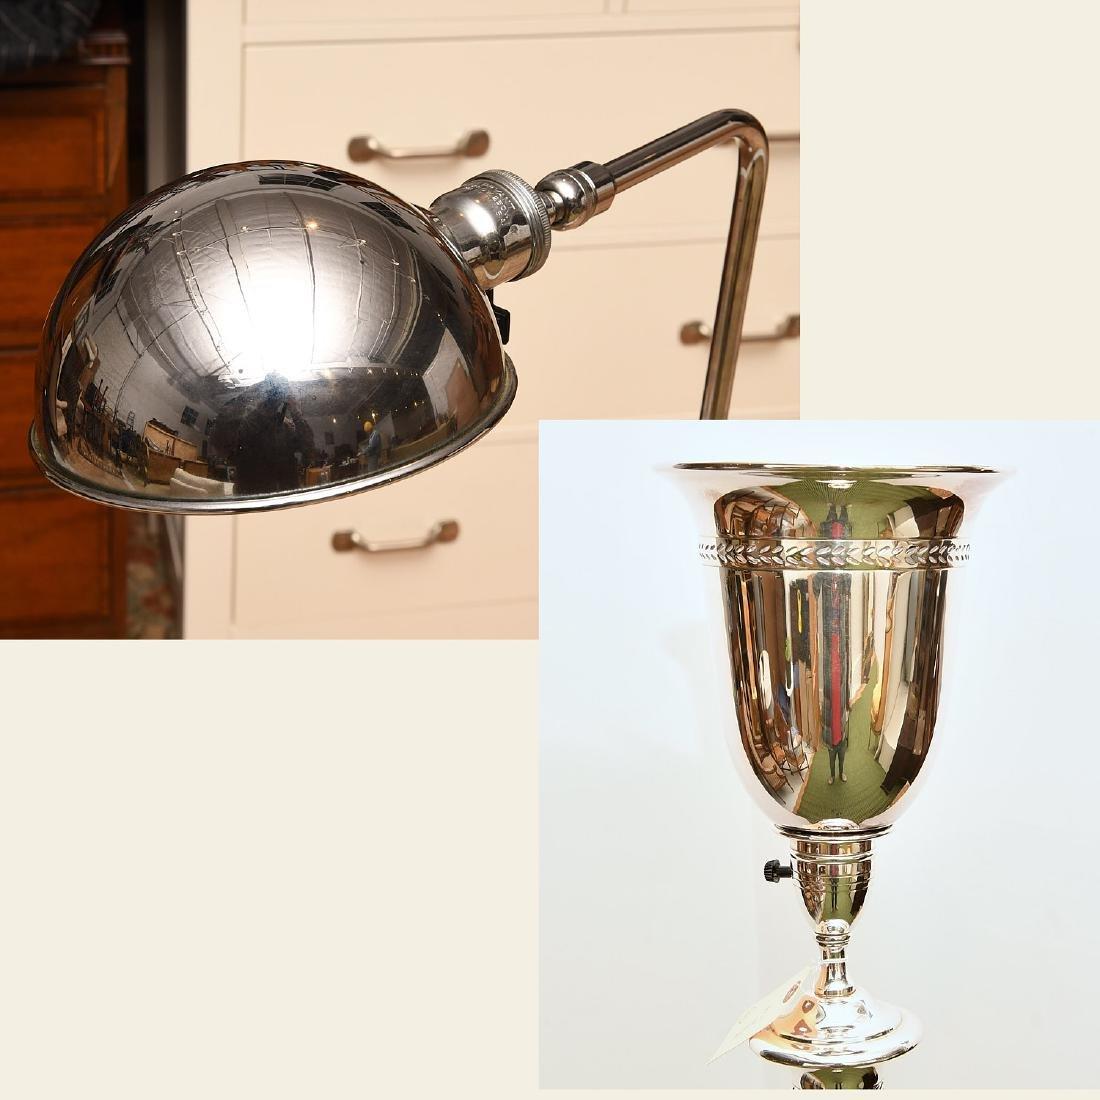 (2) Modern chrome plated floor lamps